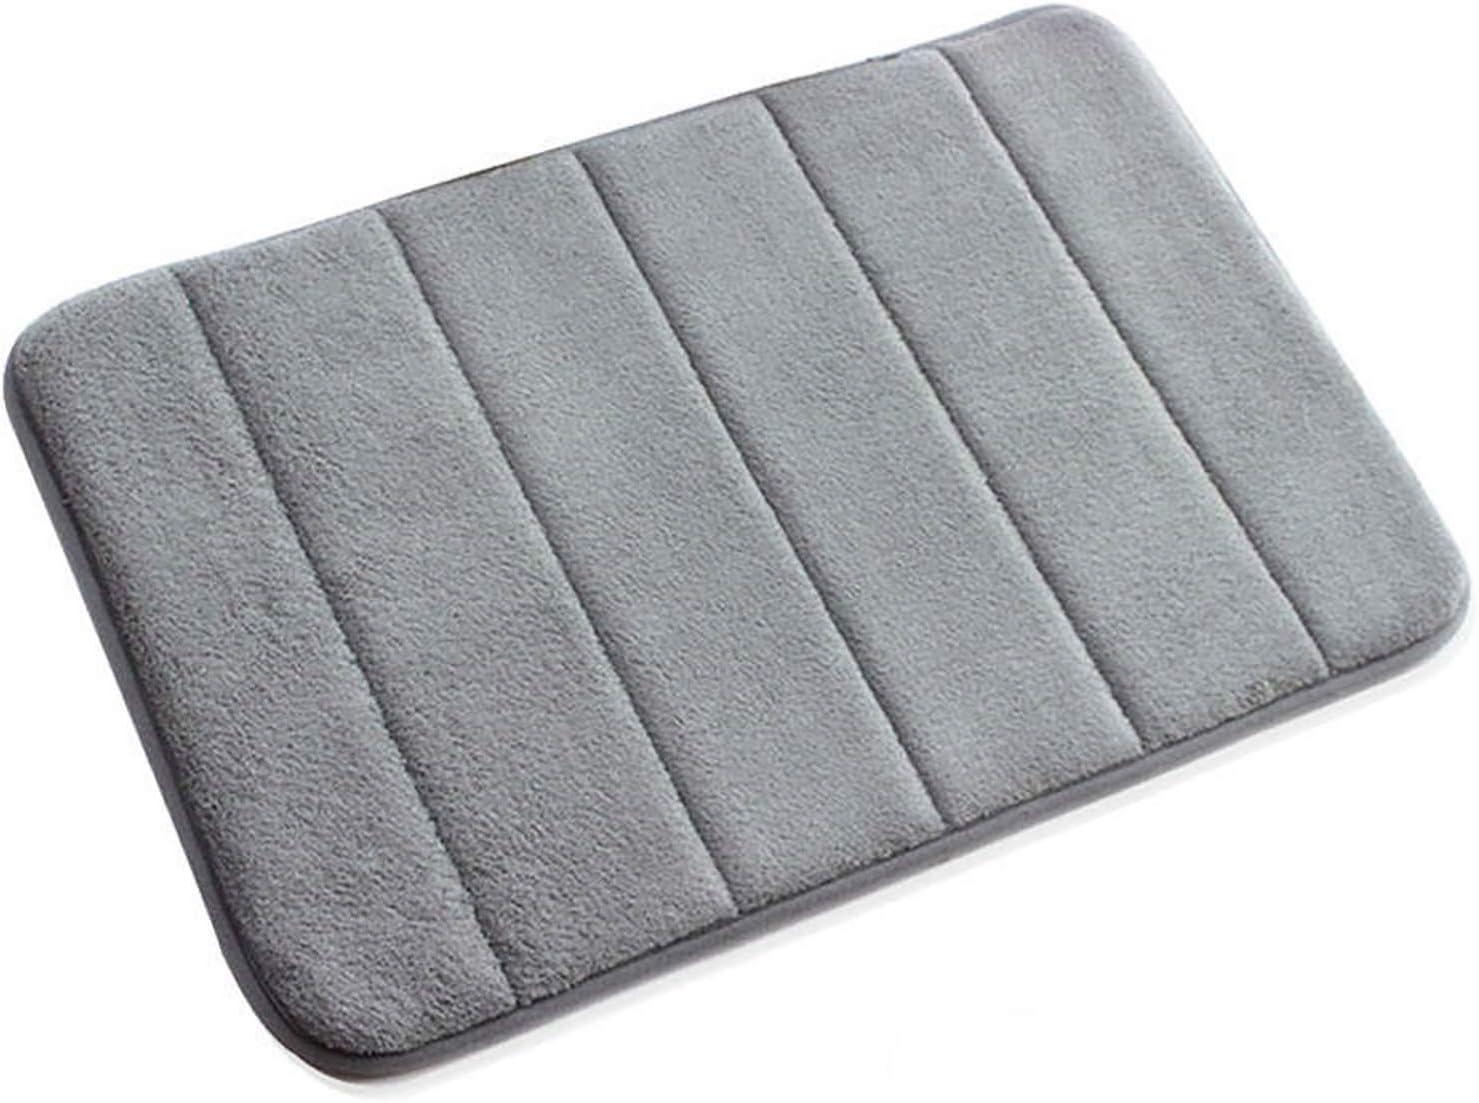 Amazon Com Vanra Small Bath Mat Bath Rugs Anti Slip Memory Foam Non Slip Bathroom Mat Soft Bathmat Carpet 15 7 X 23 6 Gray Home Kitchen